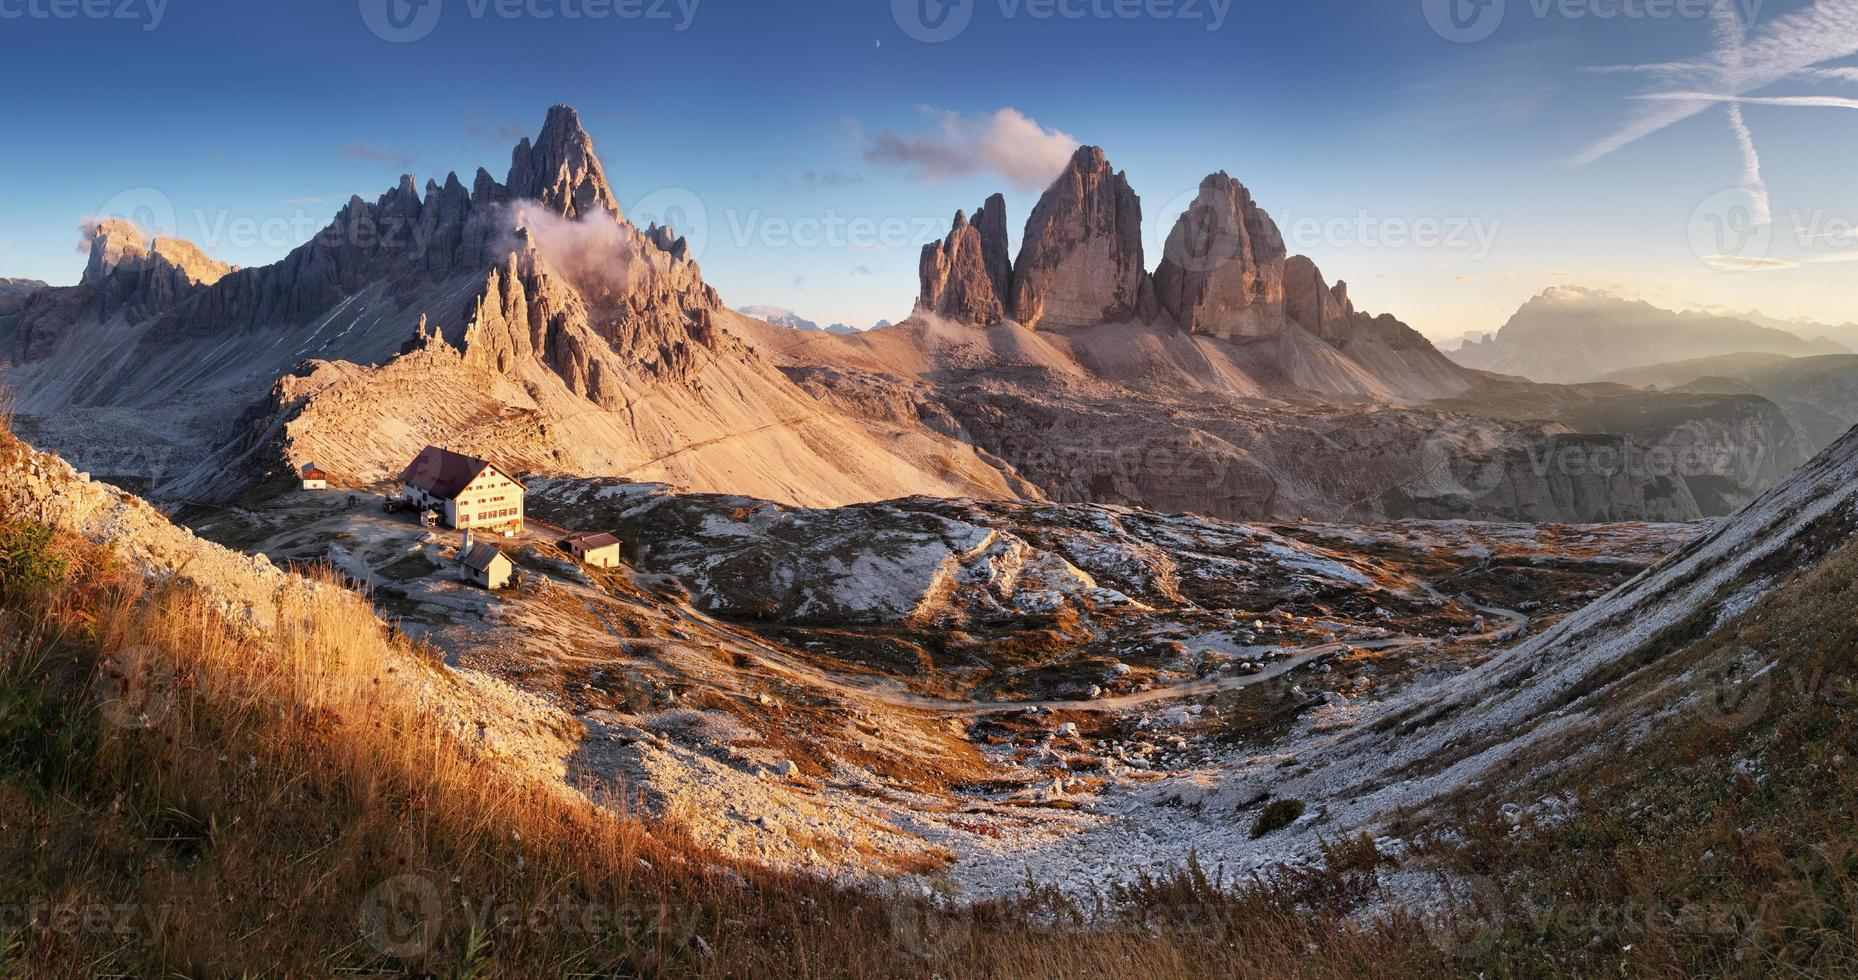 Panorama de la montaña al atardecer en los dolomitas de Italia - tre cime foto